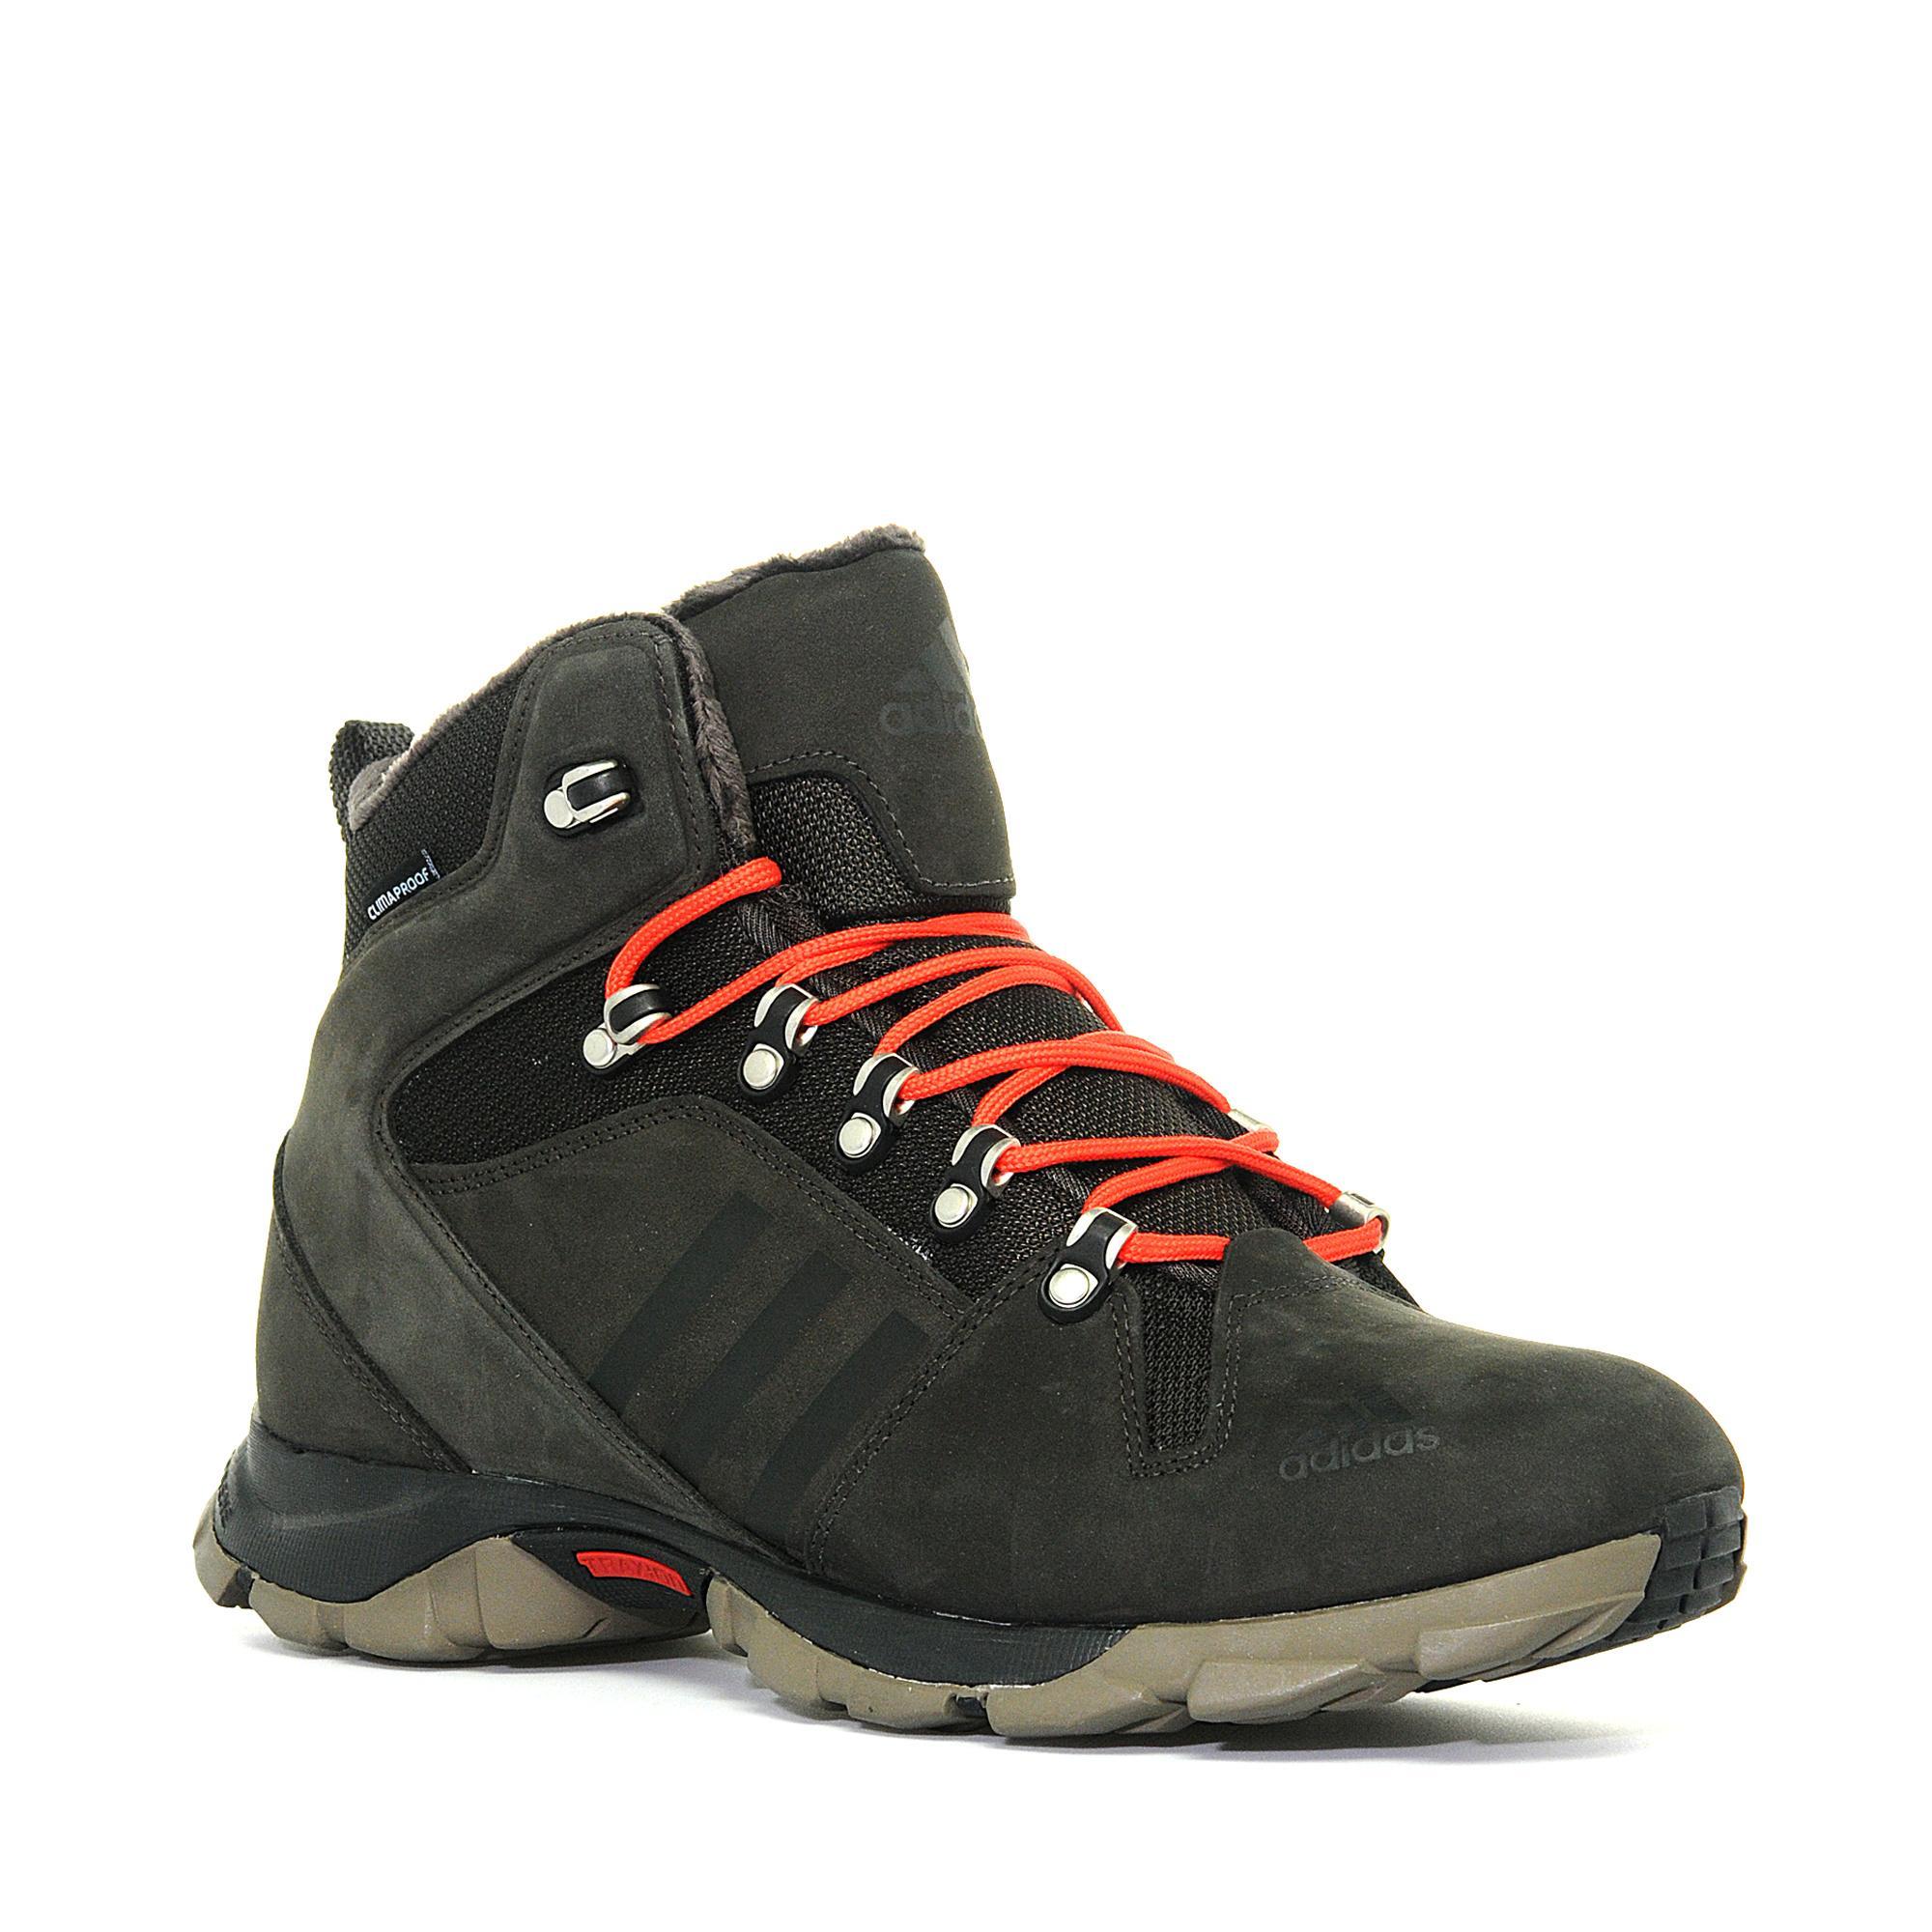 Adidas Mens Snowtrail Climaproof Snow Boots Black